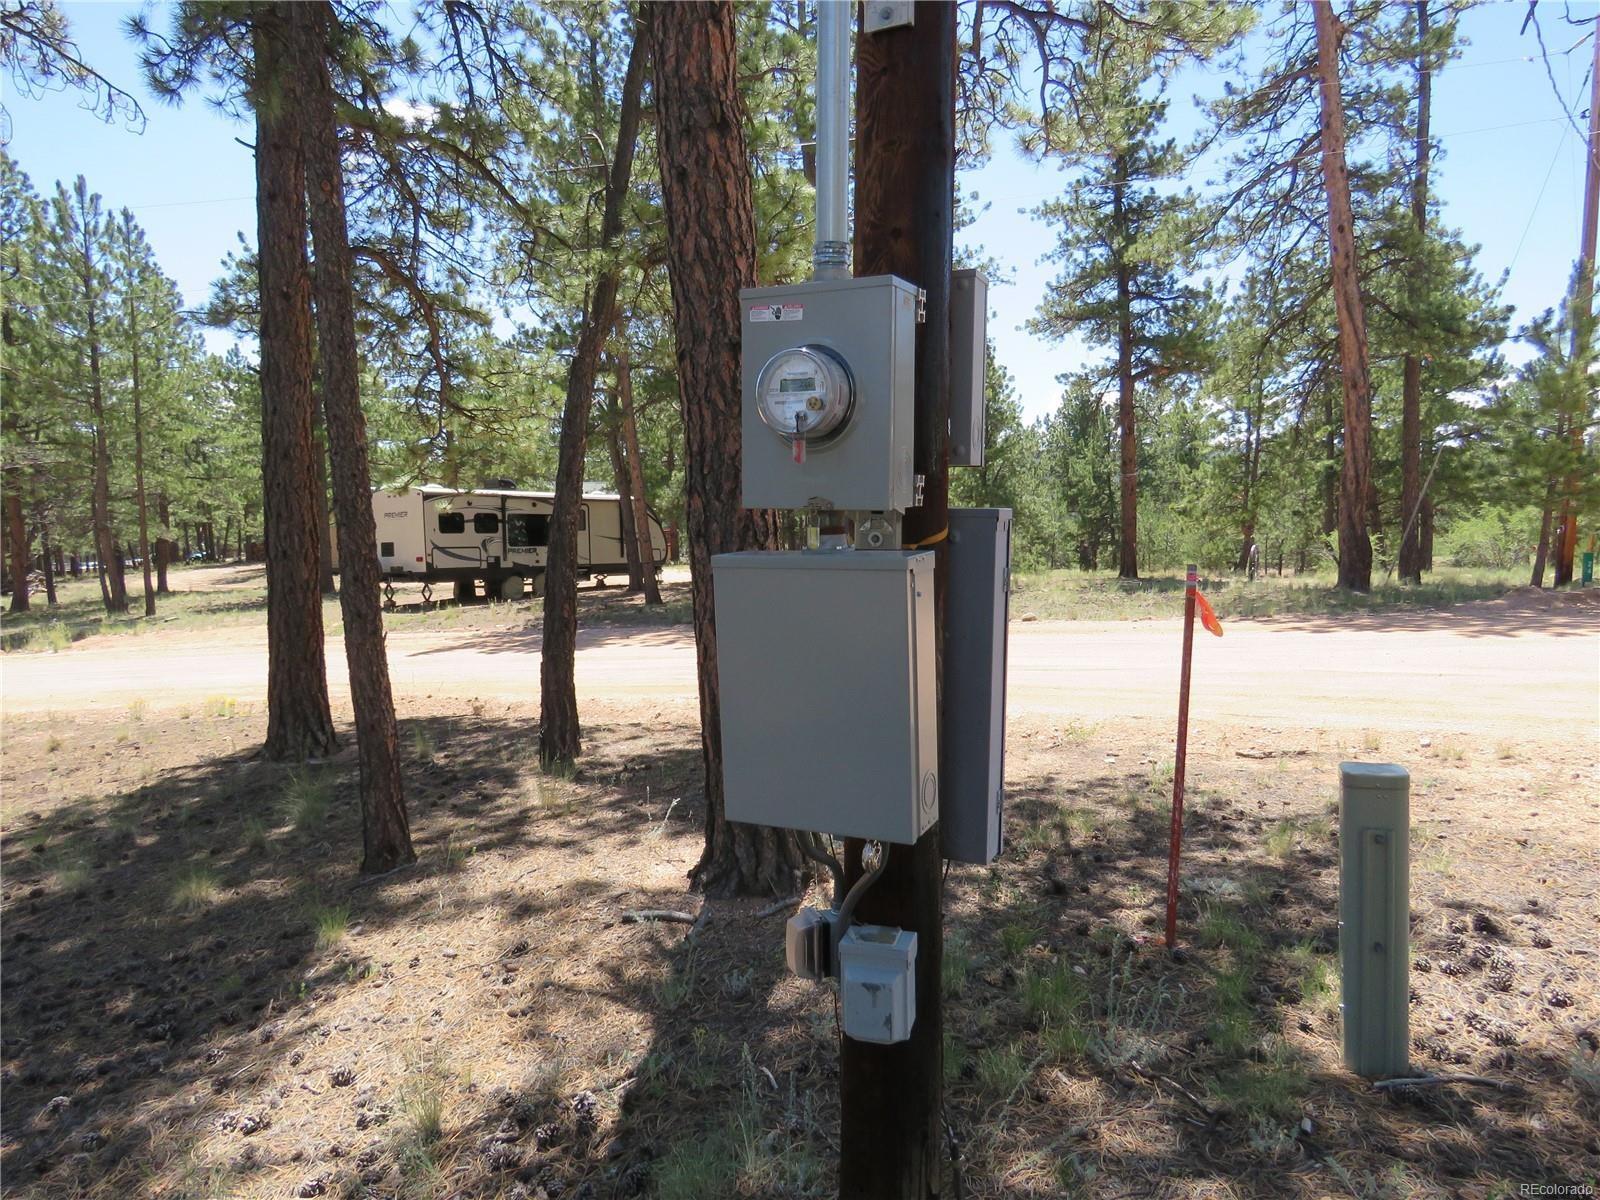 MLS# 8486542 - 4 - 43 Harness Trail, Florissant, CO 80816